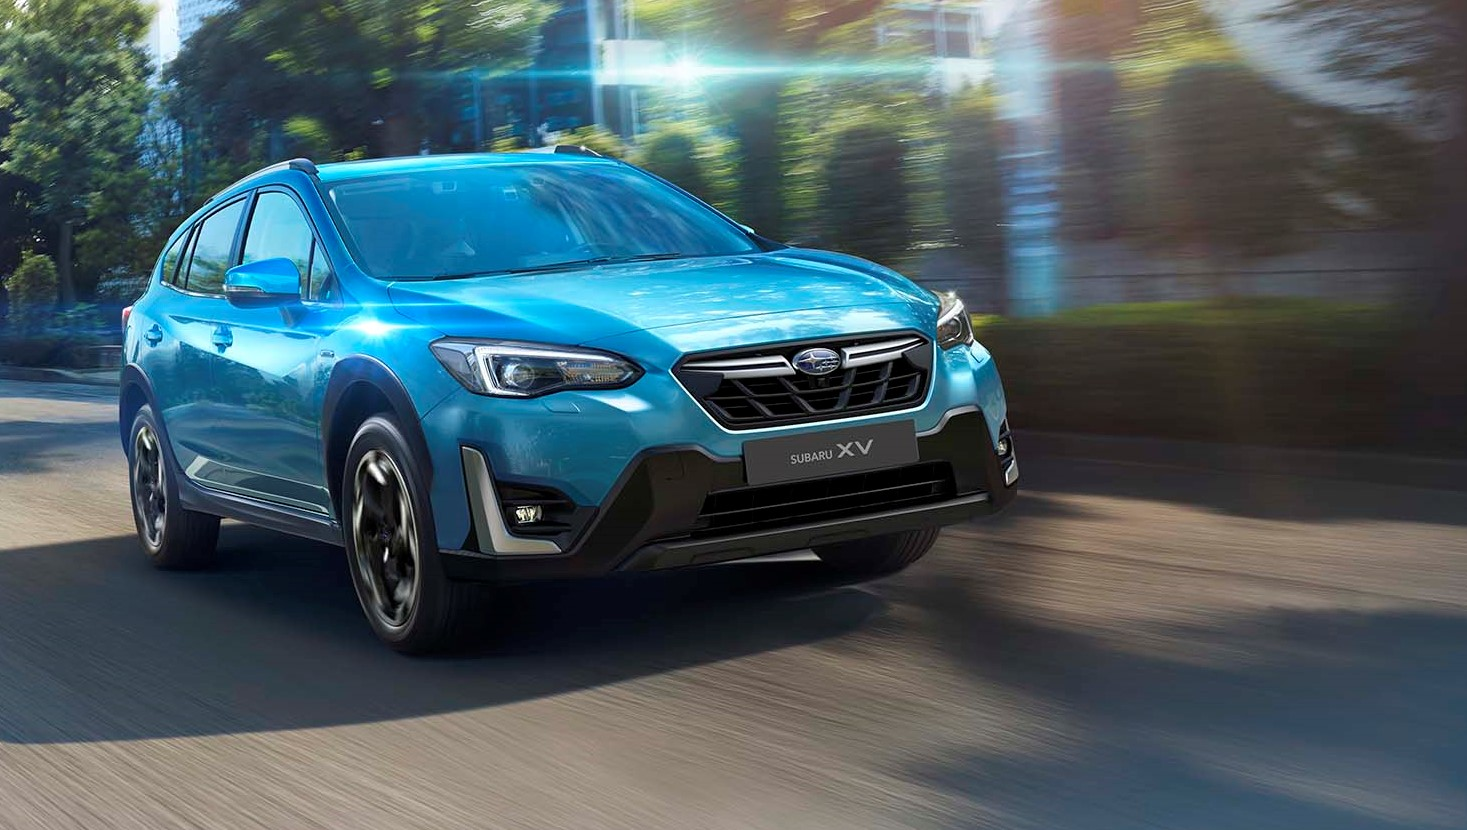 Facelifted Subaru XV goes on sale